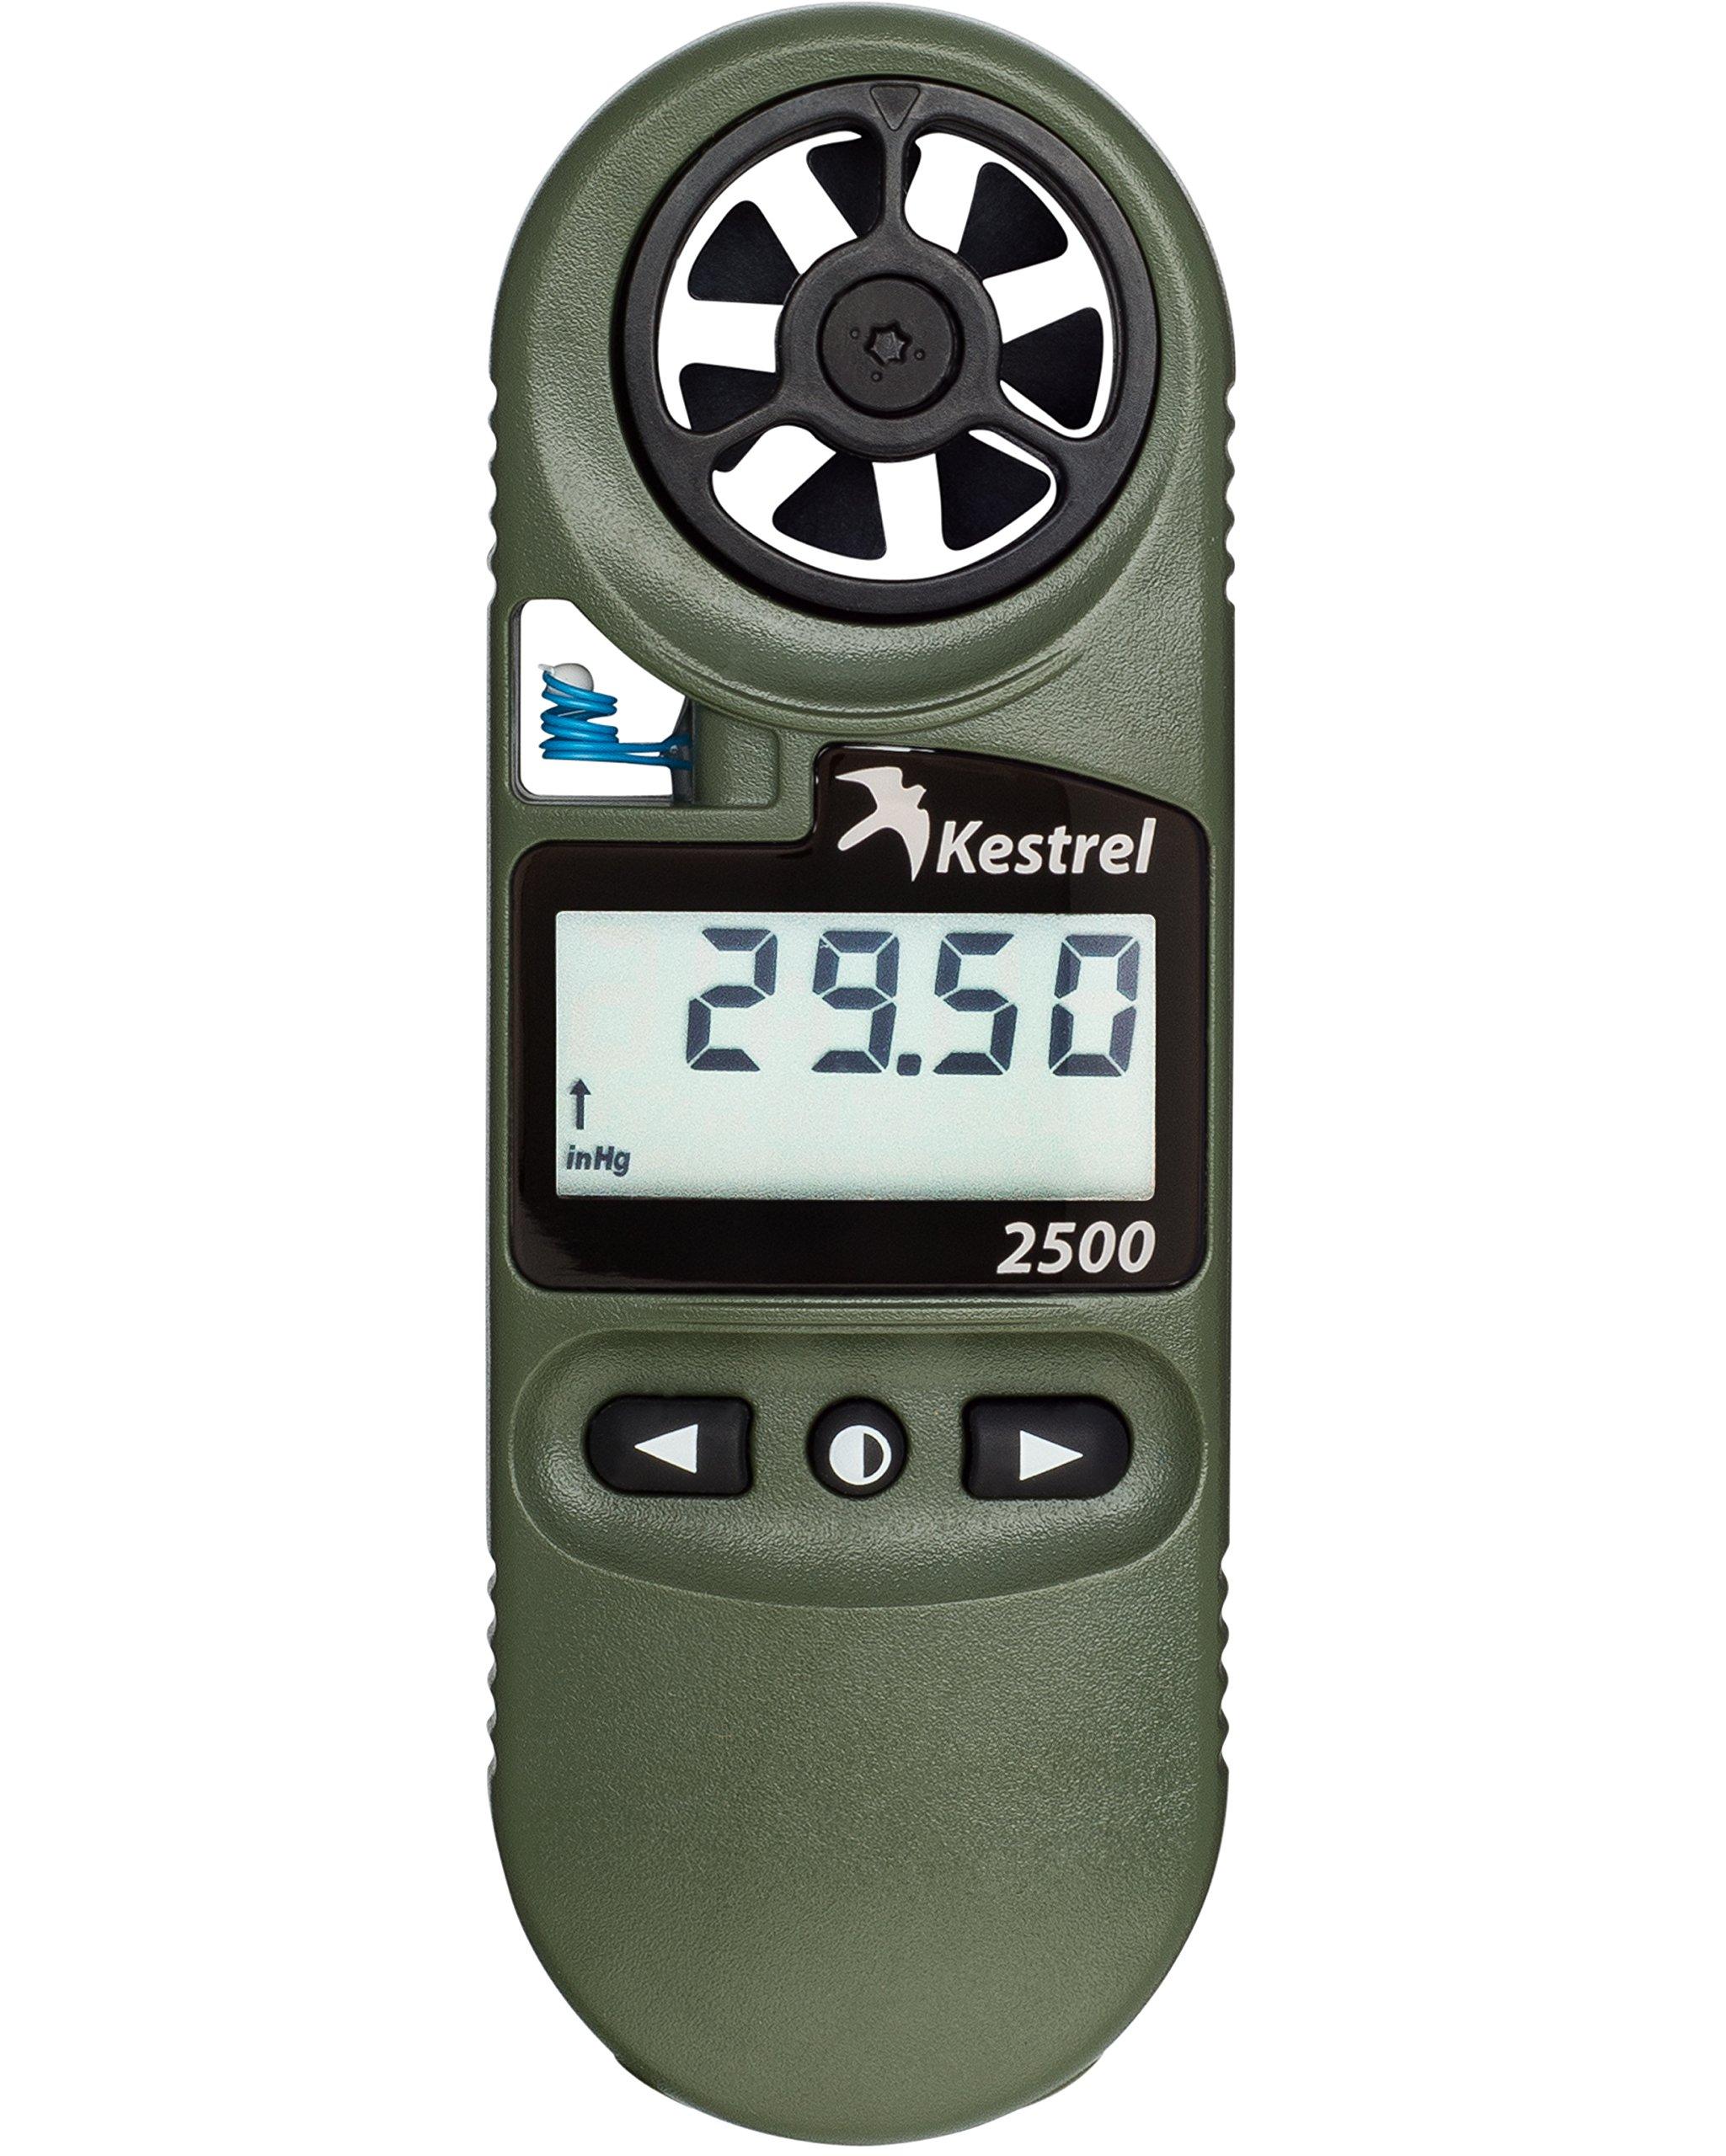 Kestrel 2500NV Pocket Weather Meter by Kestrel